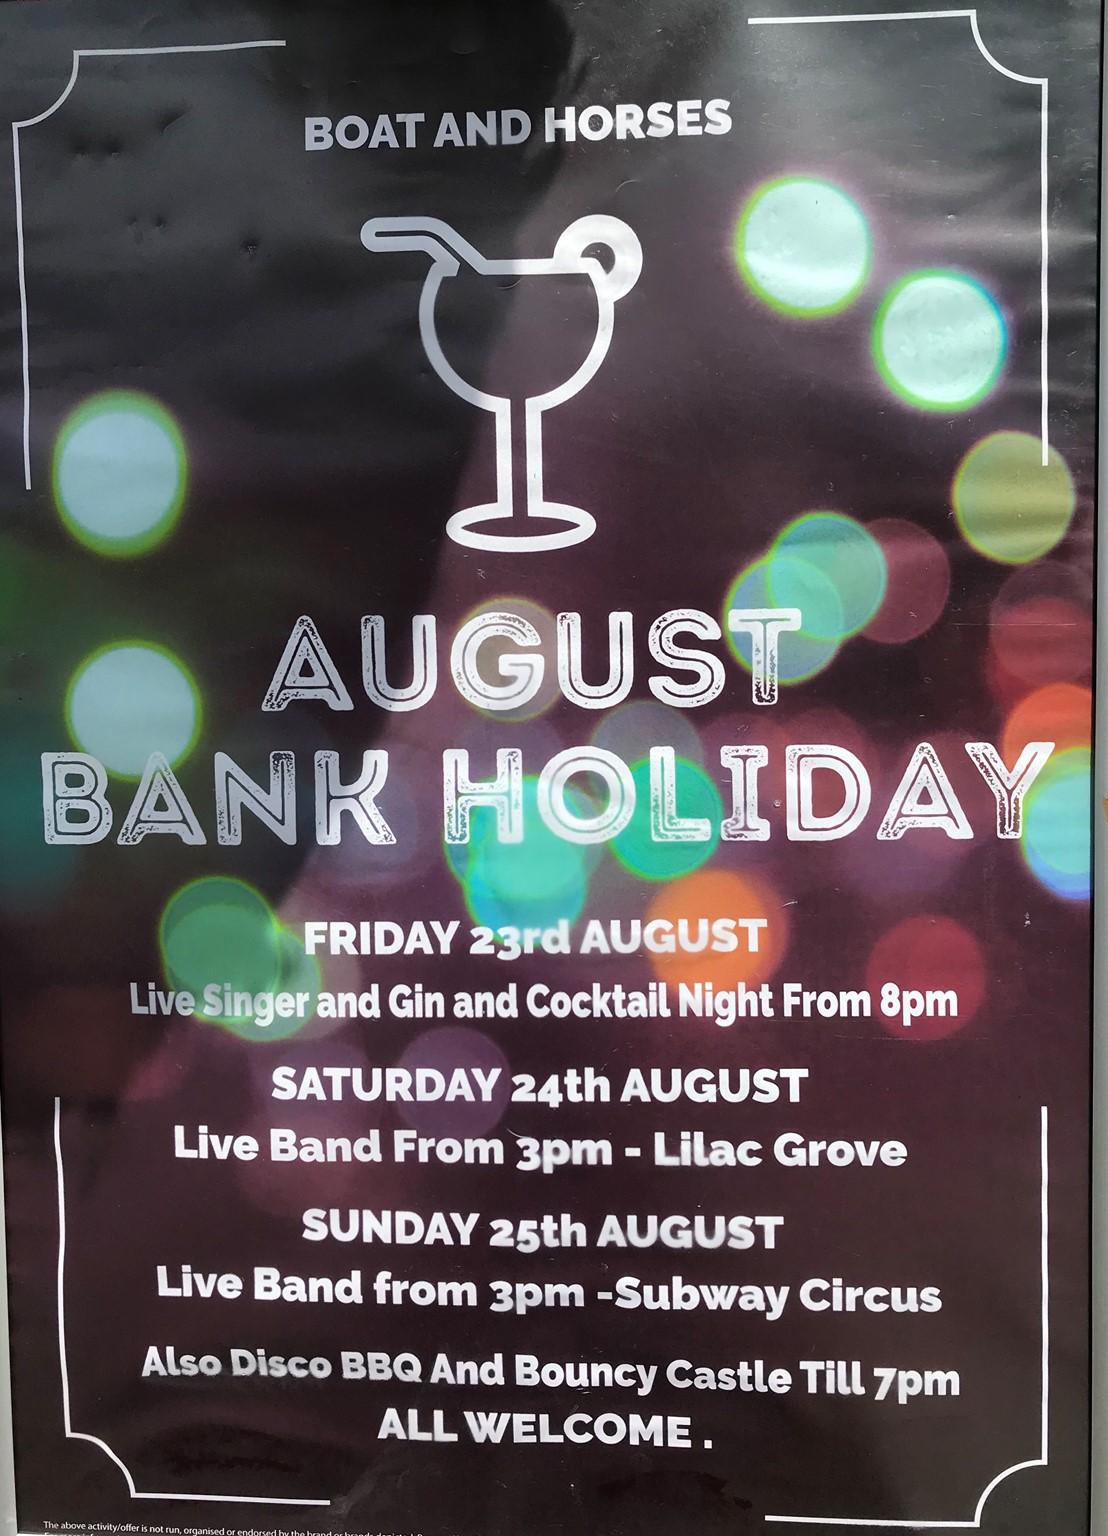 Bank Holiday - Live Music